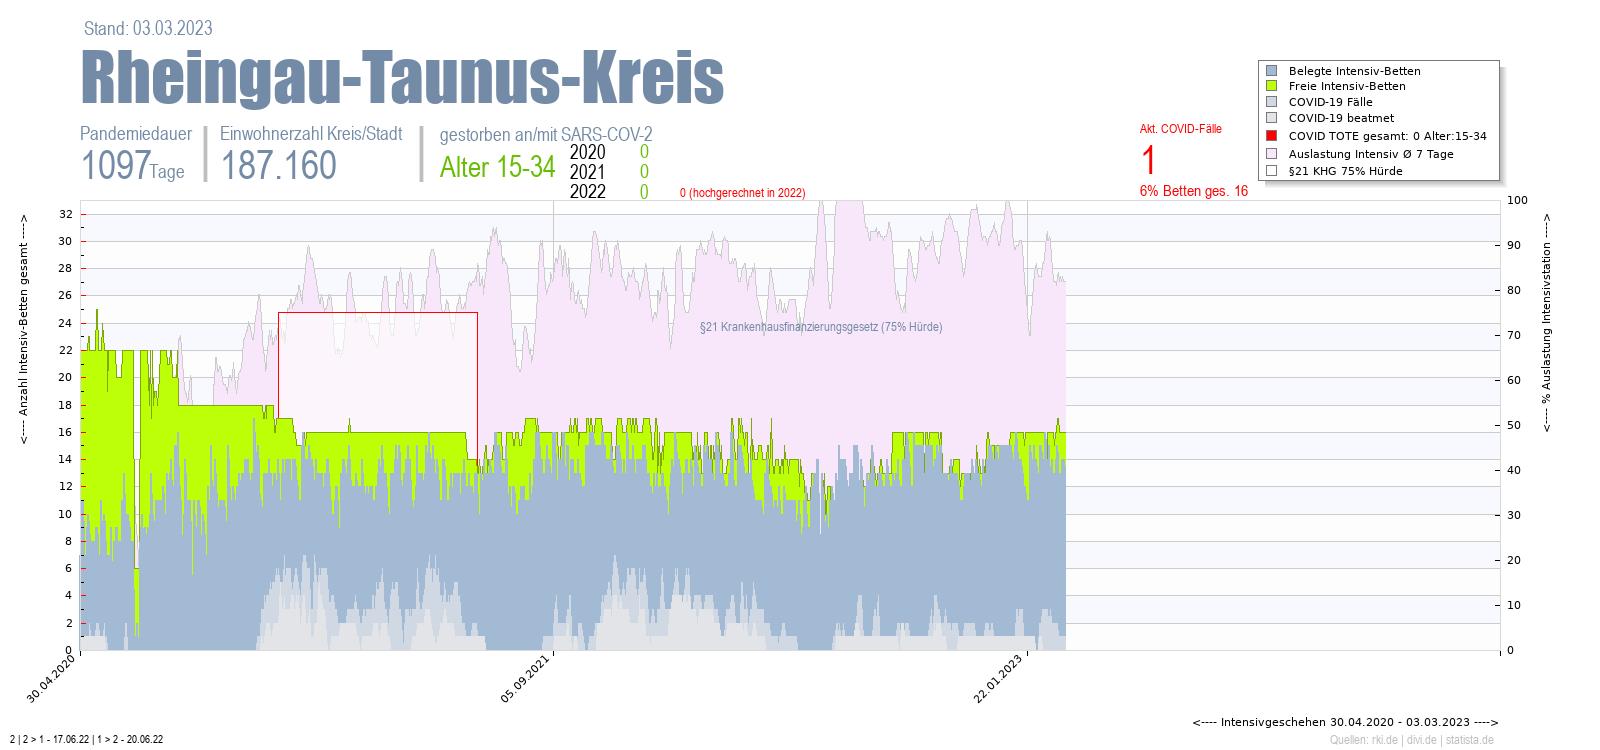 Intensivstation Auslastung Rheingau-Taunus-Kreis Alter 0-4